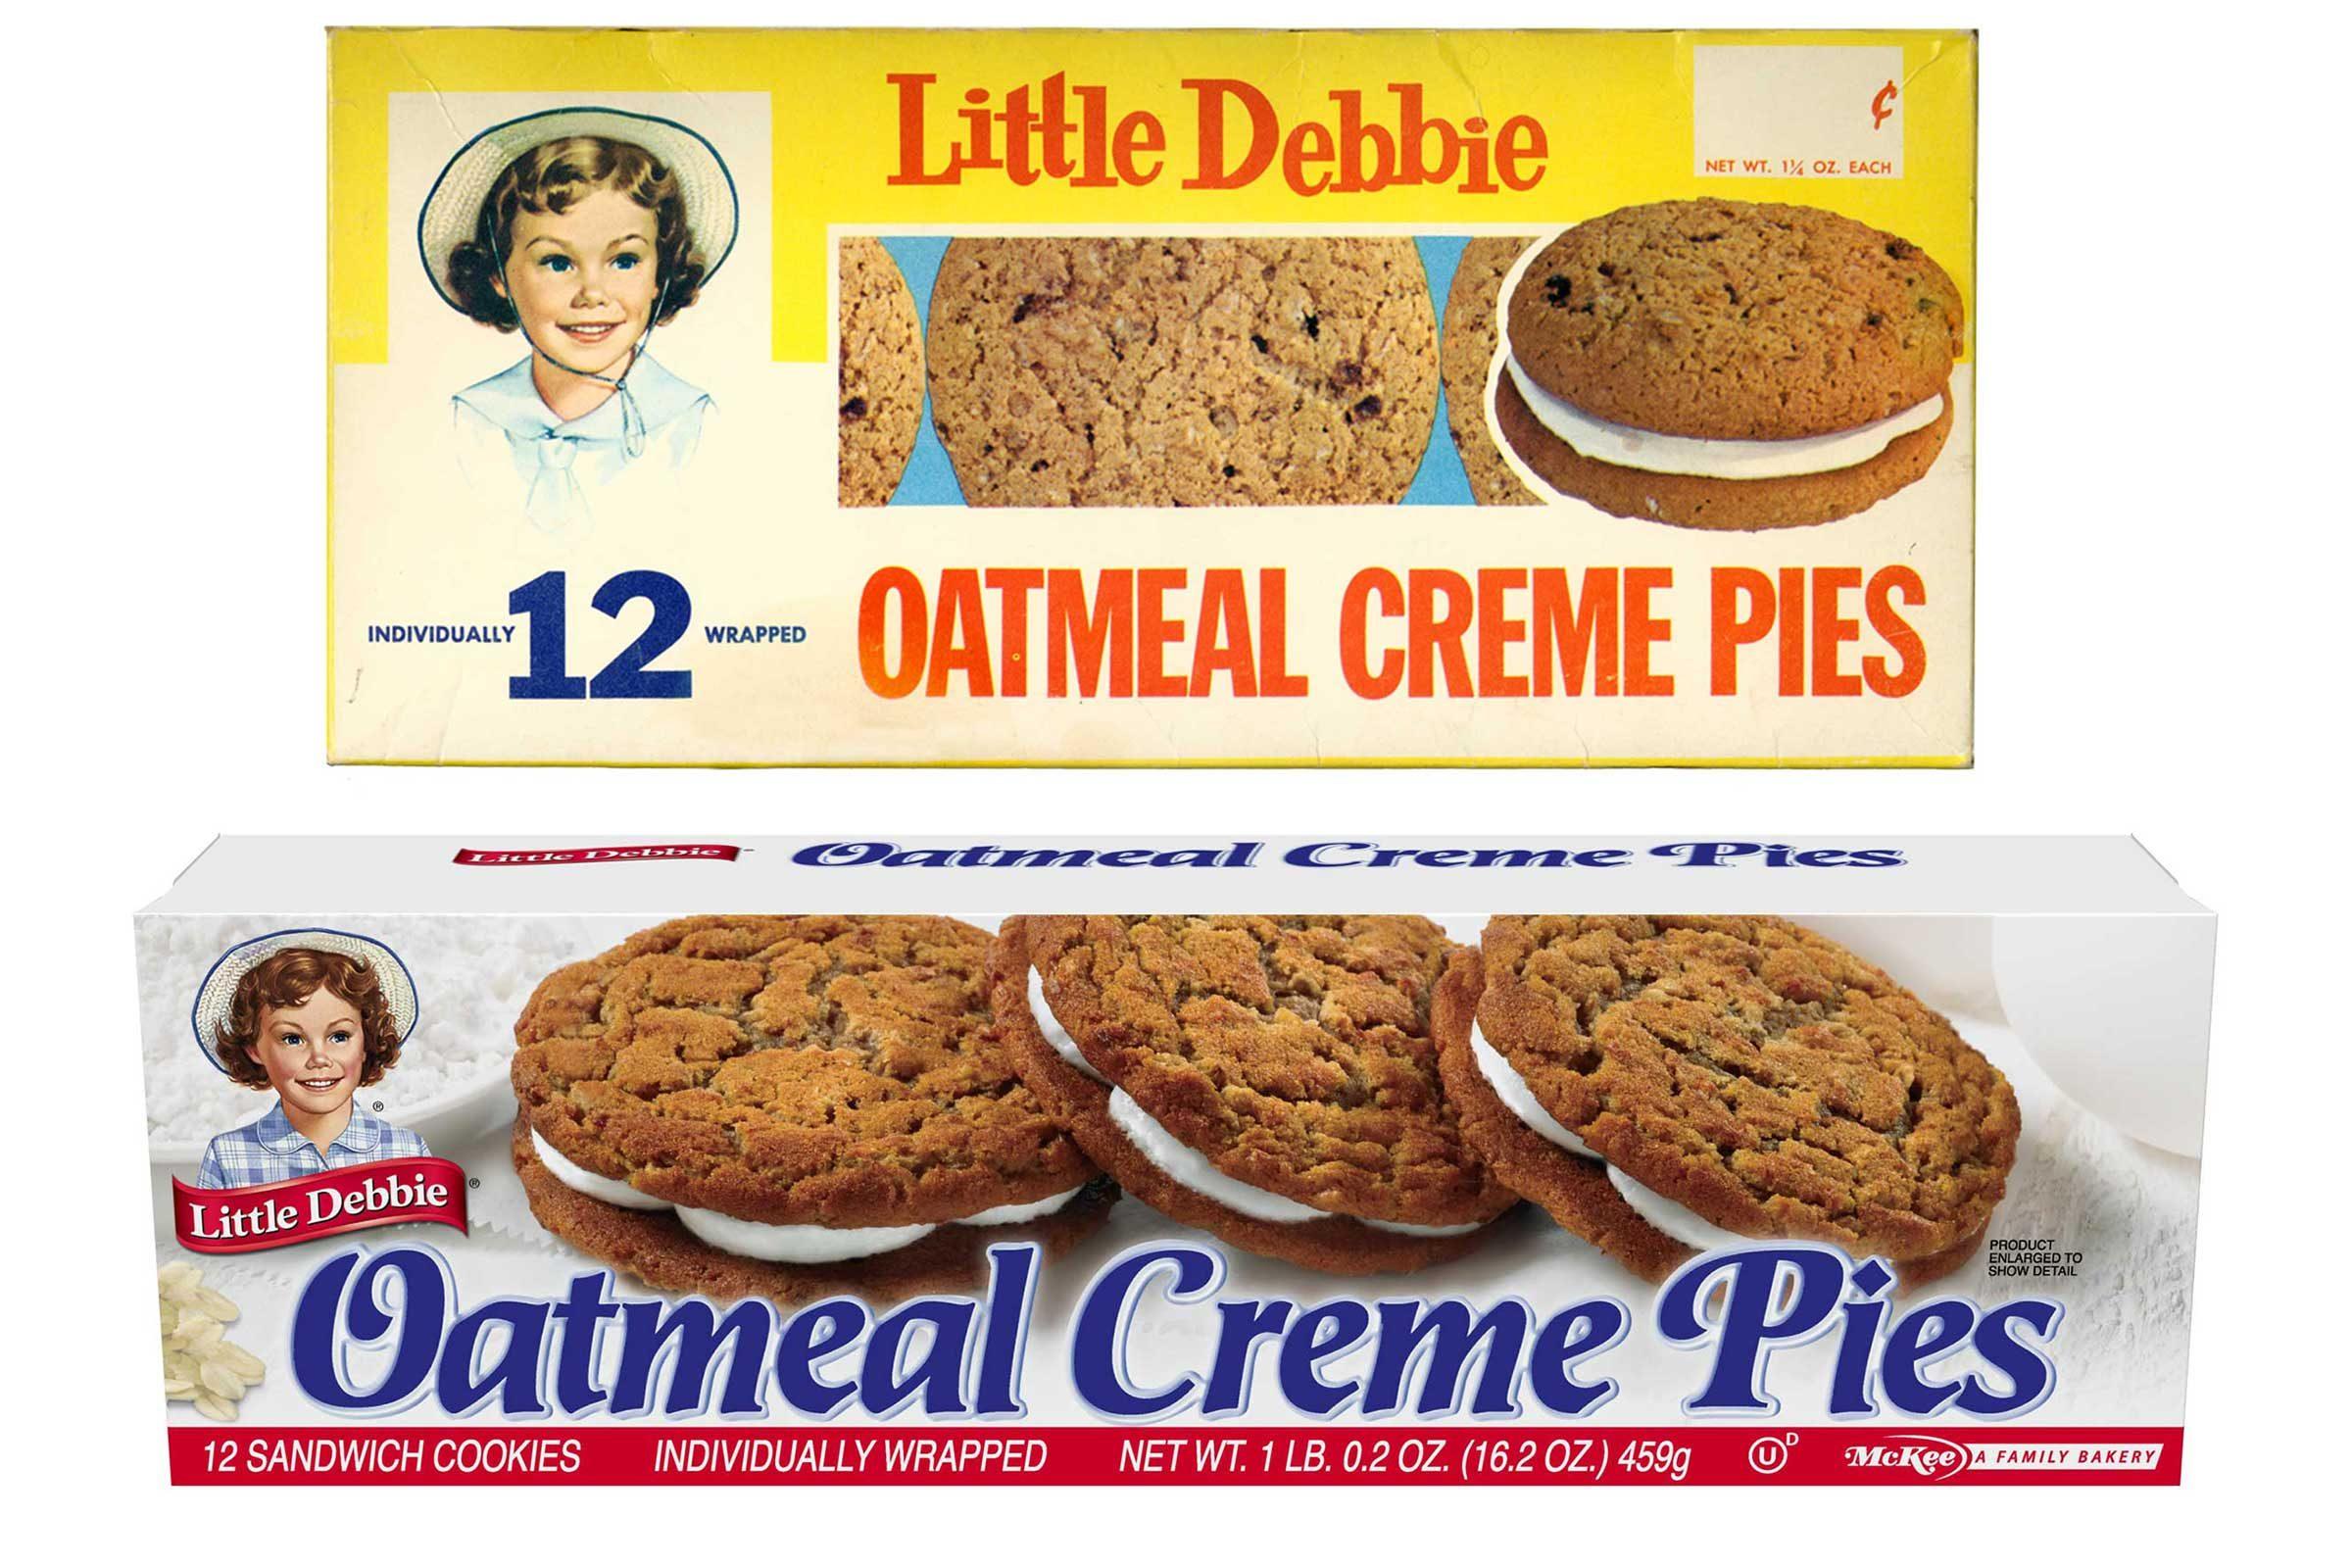 oatmeal creme pies